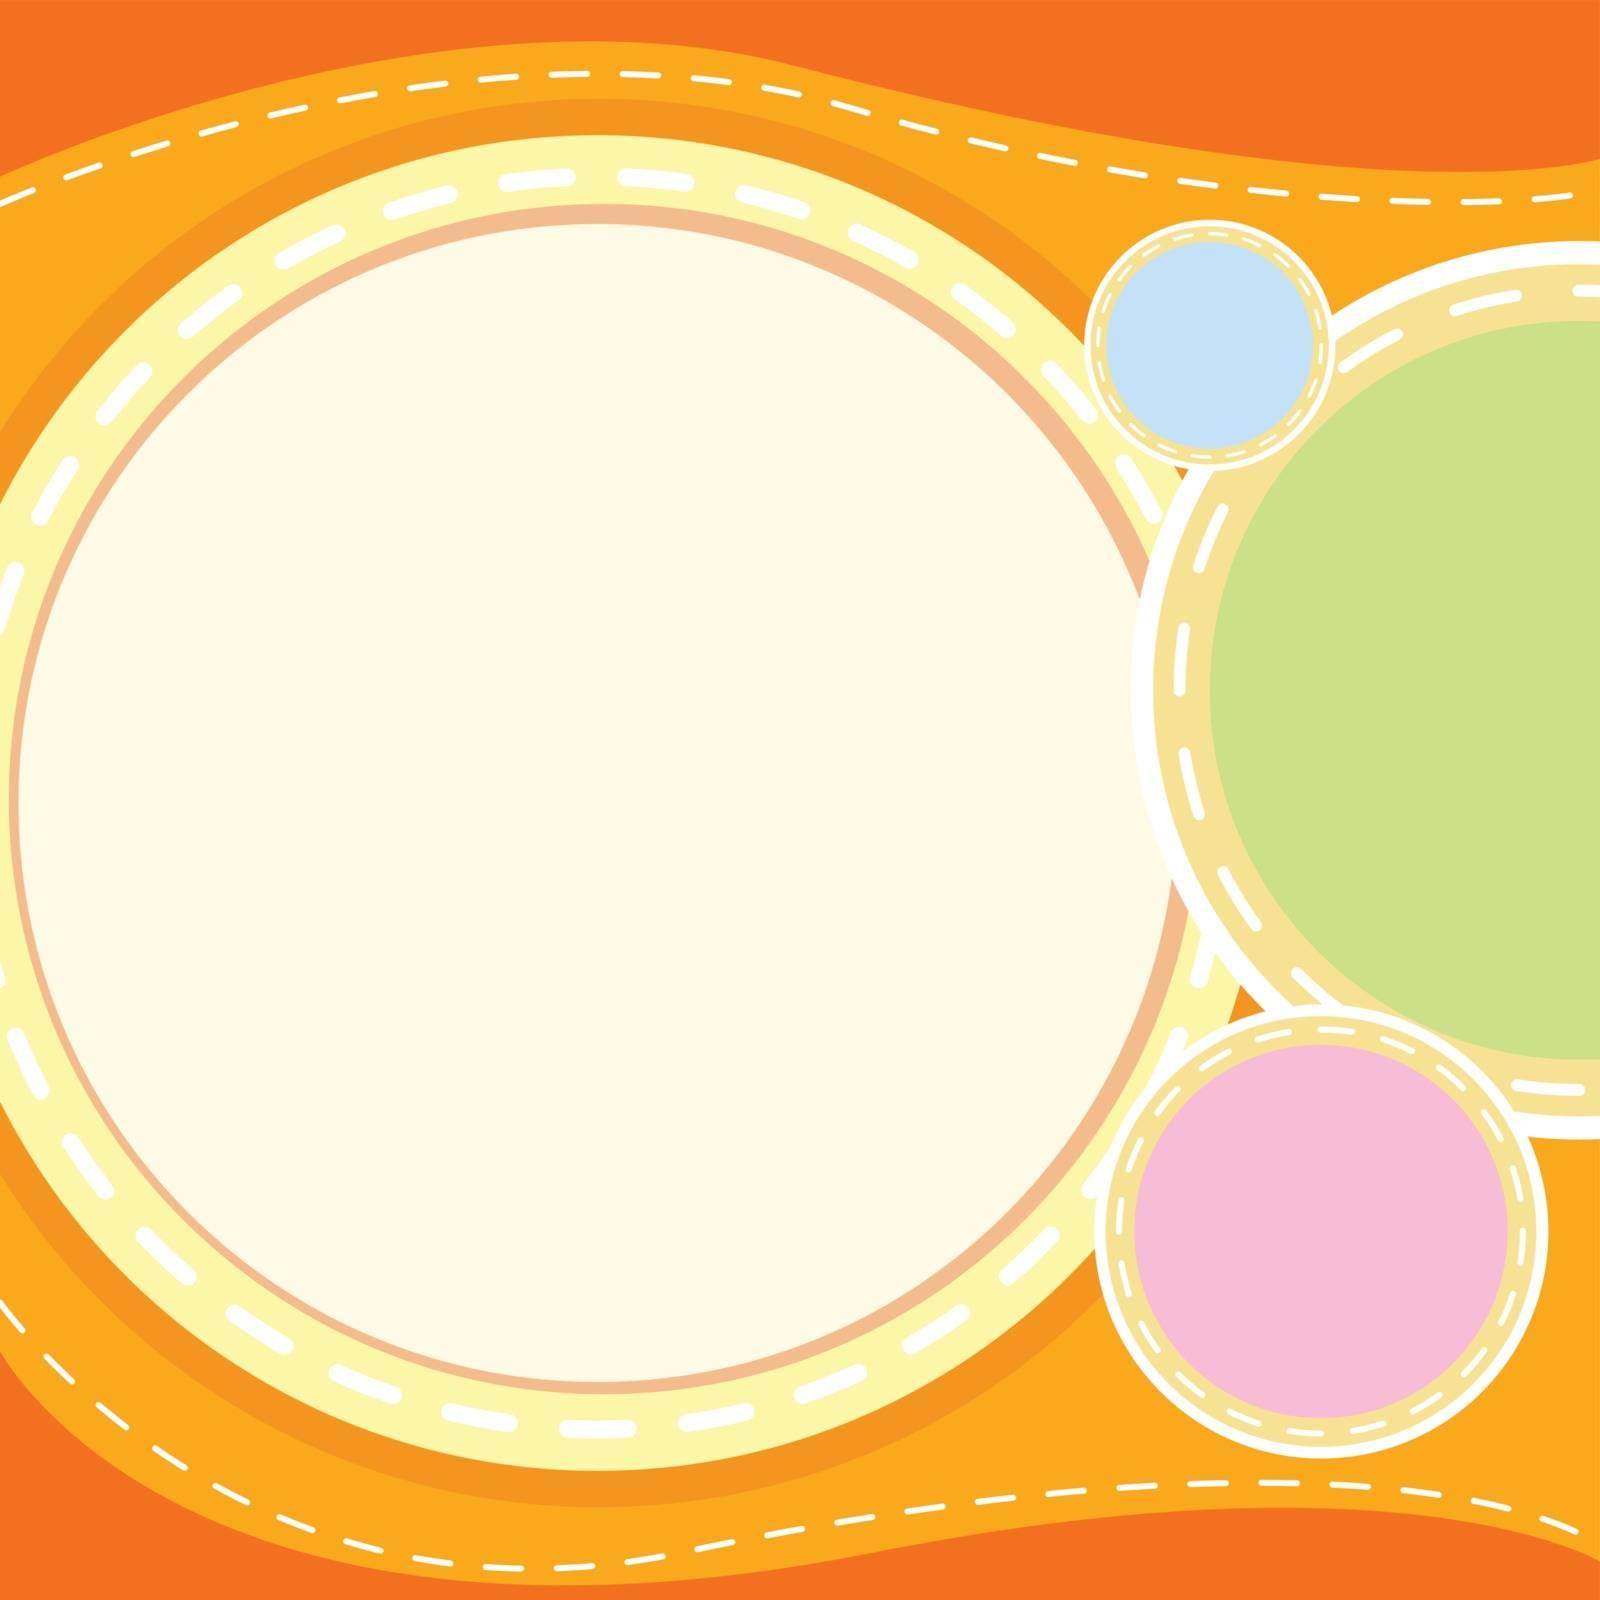 illustration of an orange wallpaper